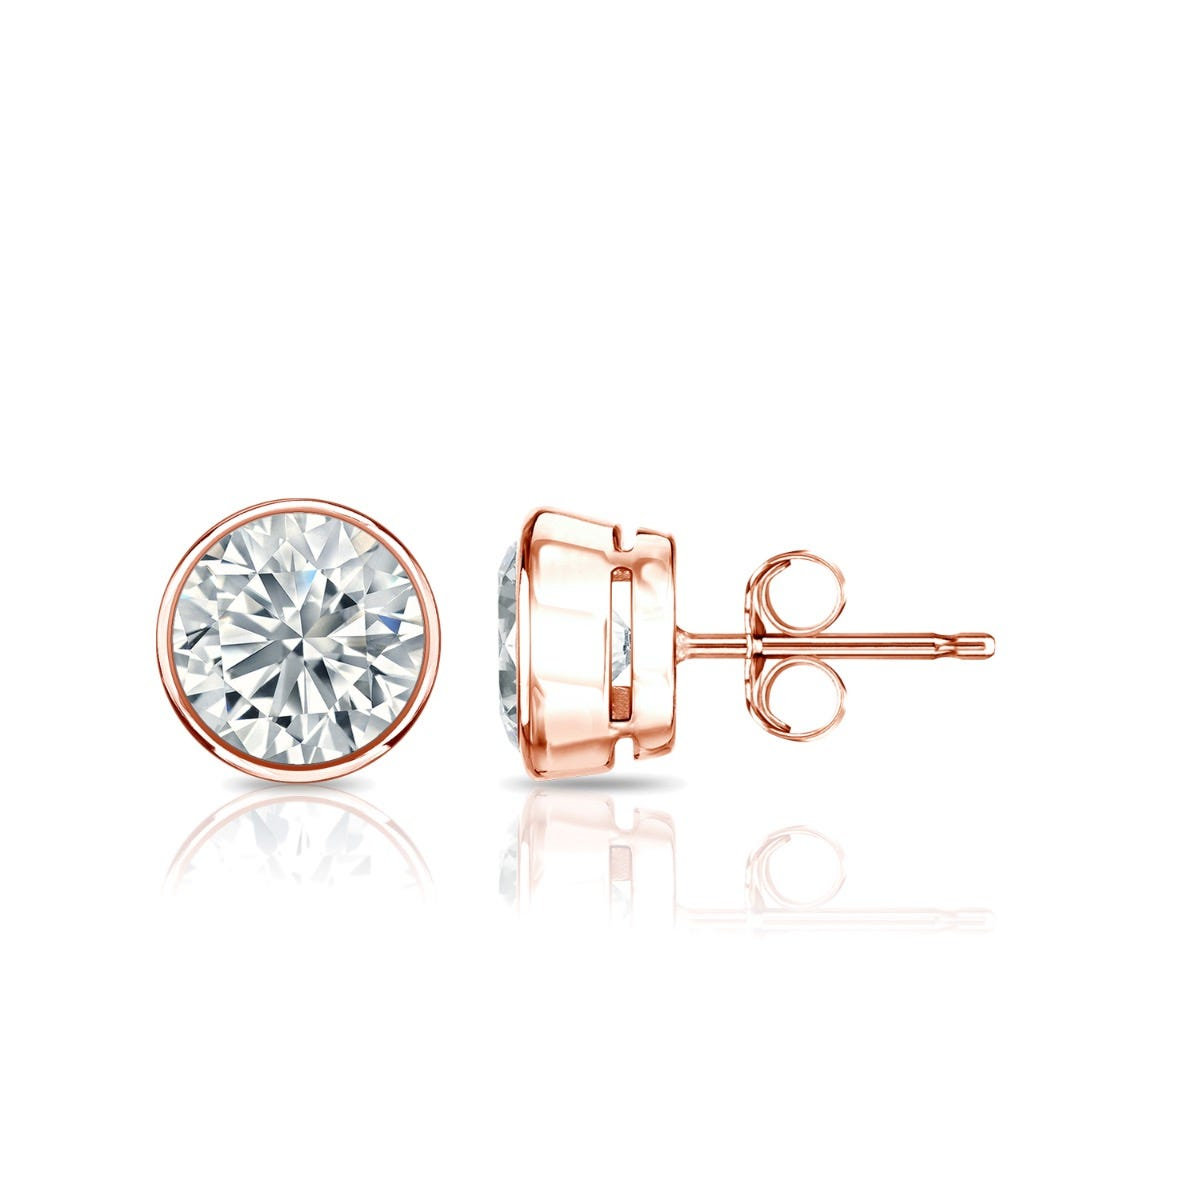 Diamond Round Bezel-Set 1ctw. Solitaire Stud (IJ-I2) Earrings in 10K Rose Gold